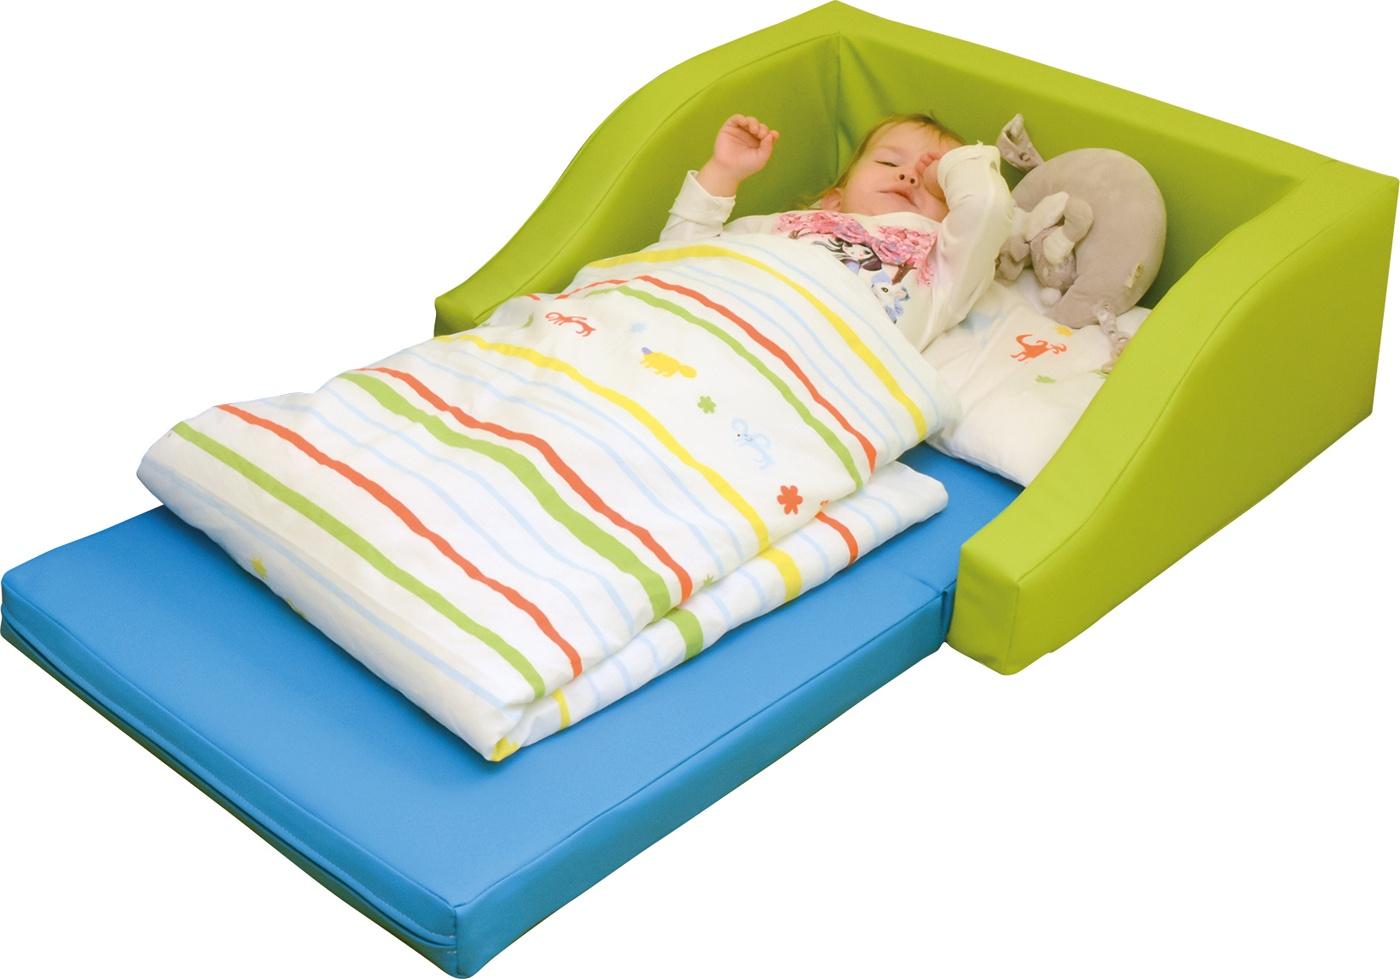 kindergarten halbes schaumstoff bettchen inkl matratze livaro. Black Bedroom Furniture Sets. Home Design Ideas